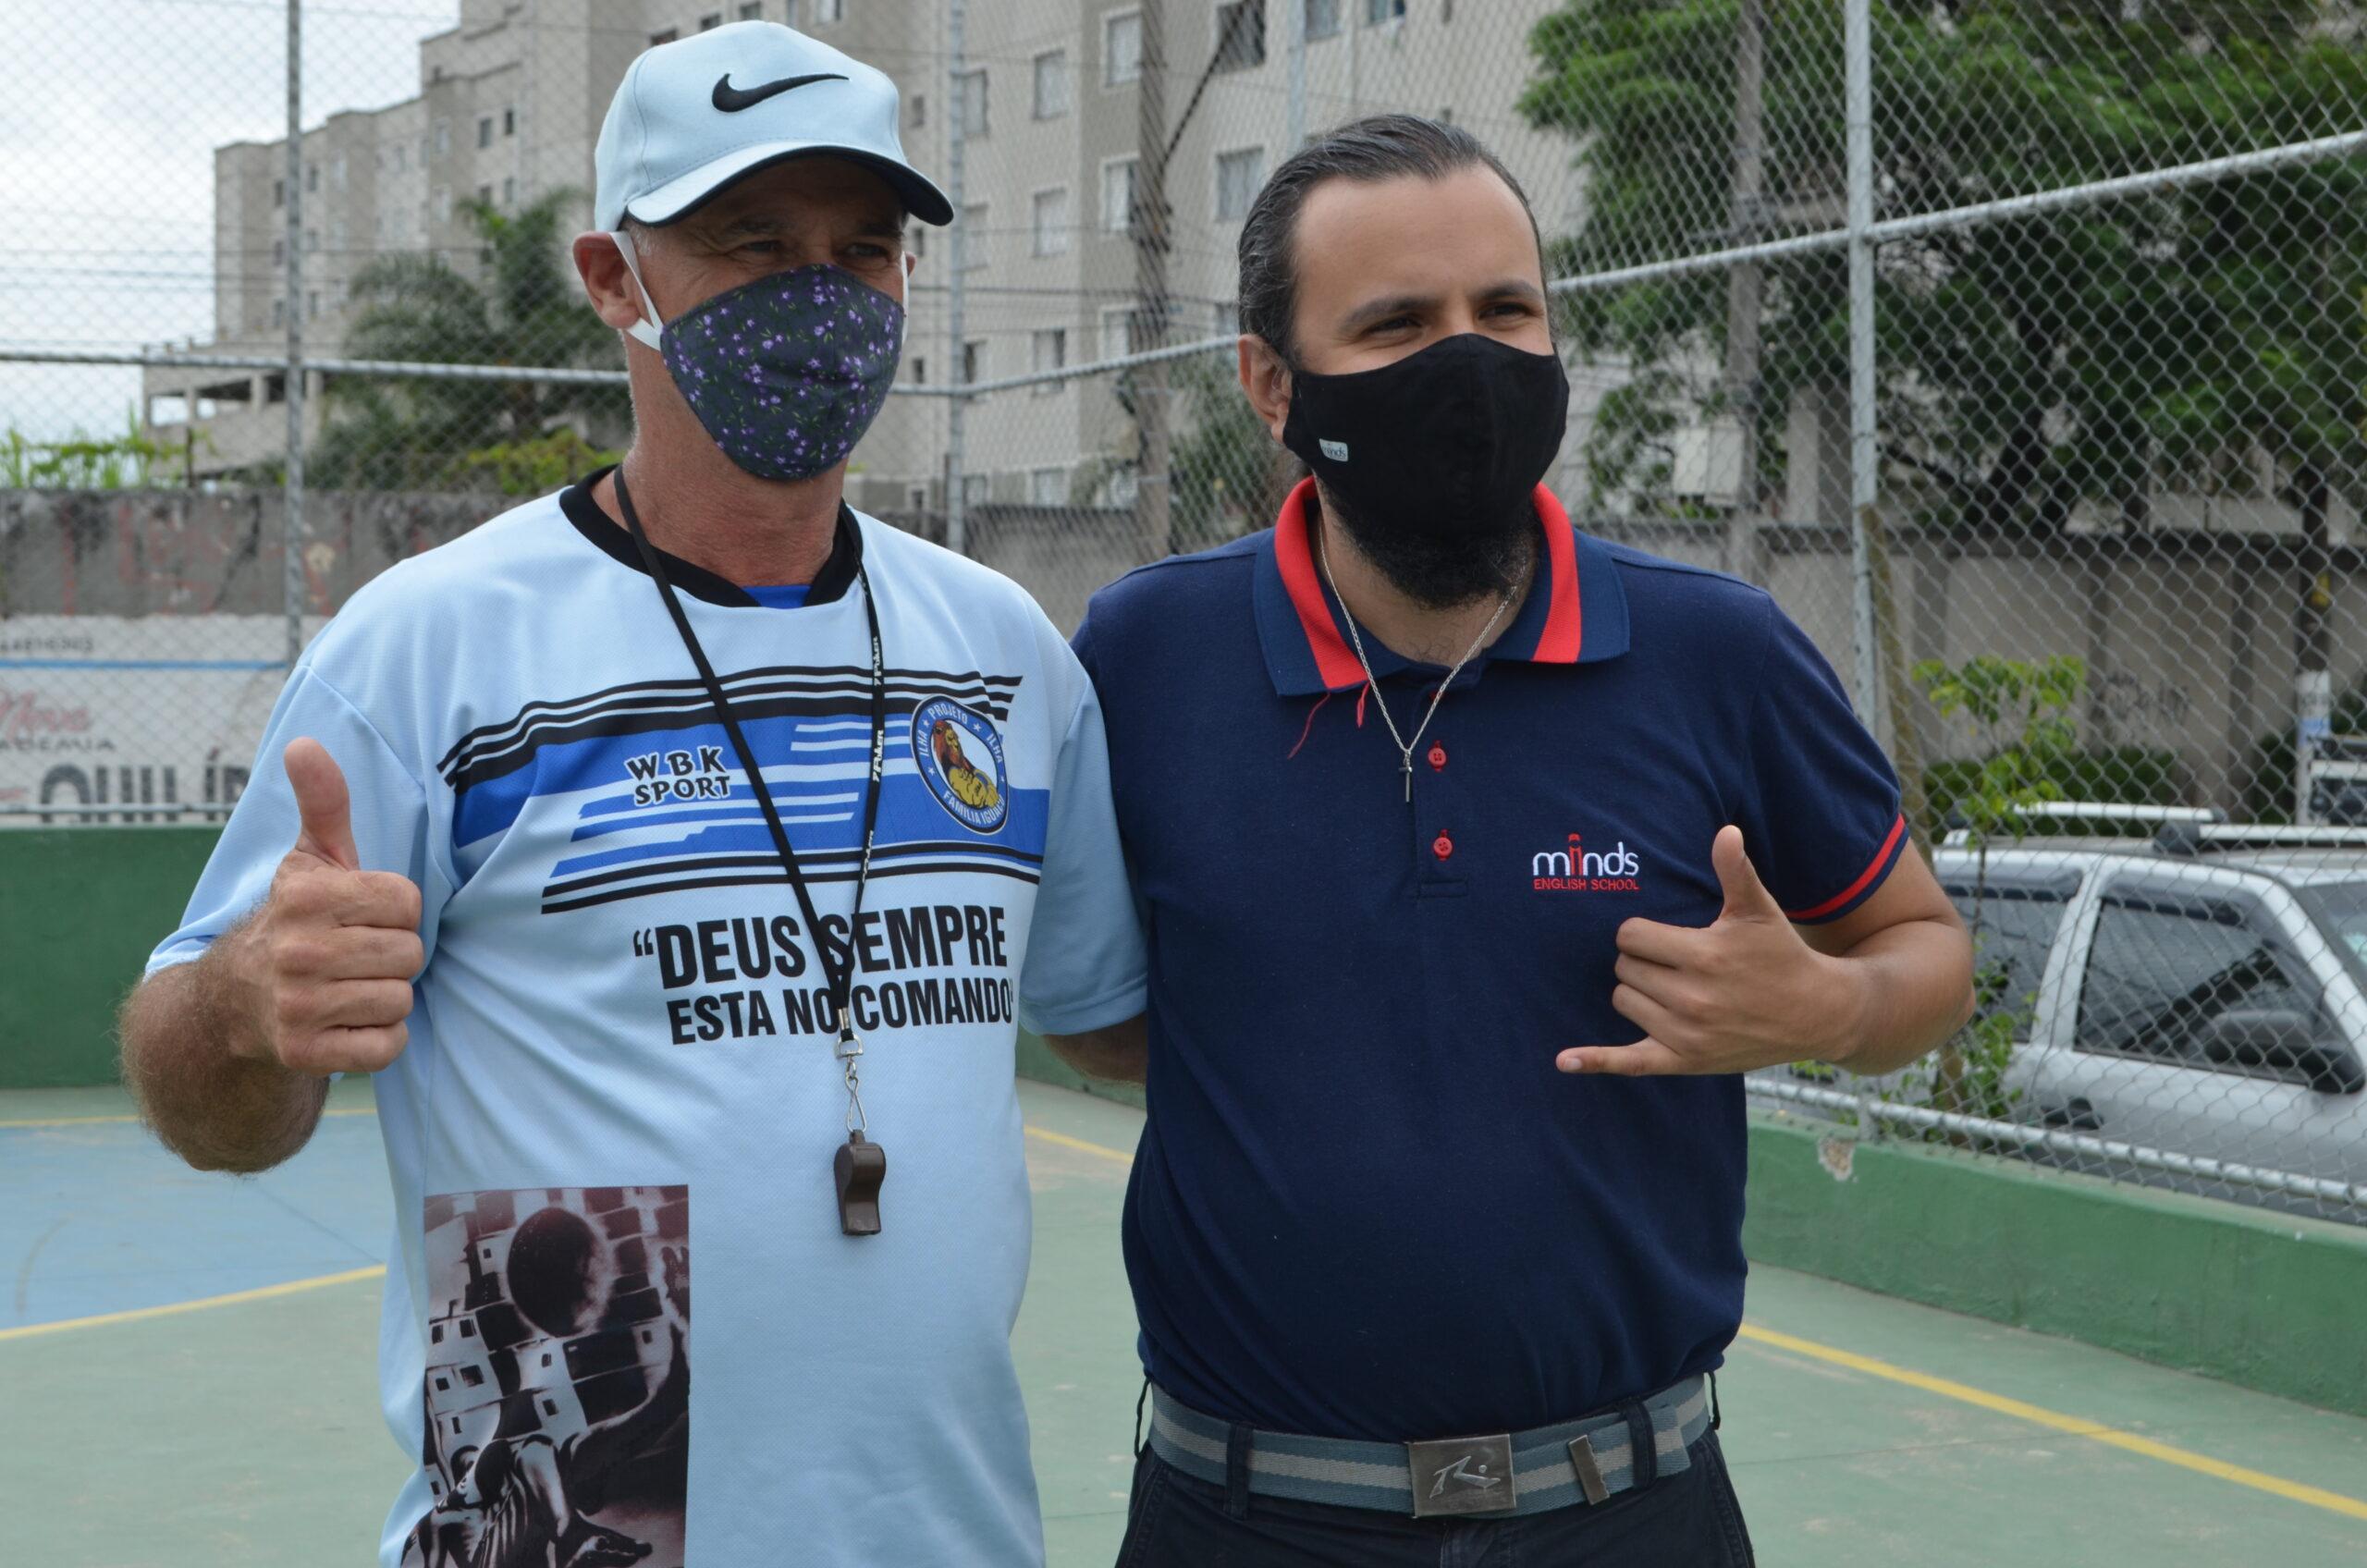 Minds Idiomas e Enactus UFABC se unem ao projeto Família Iguaçu